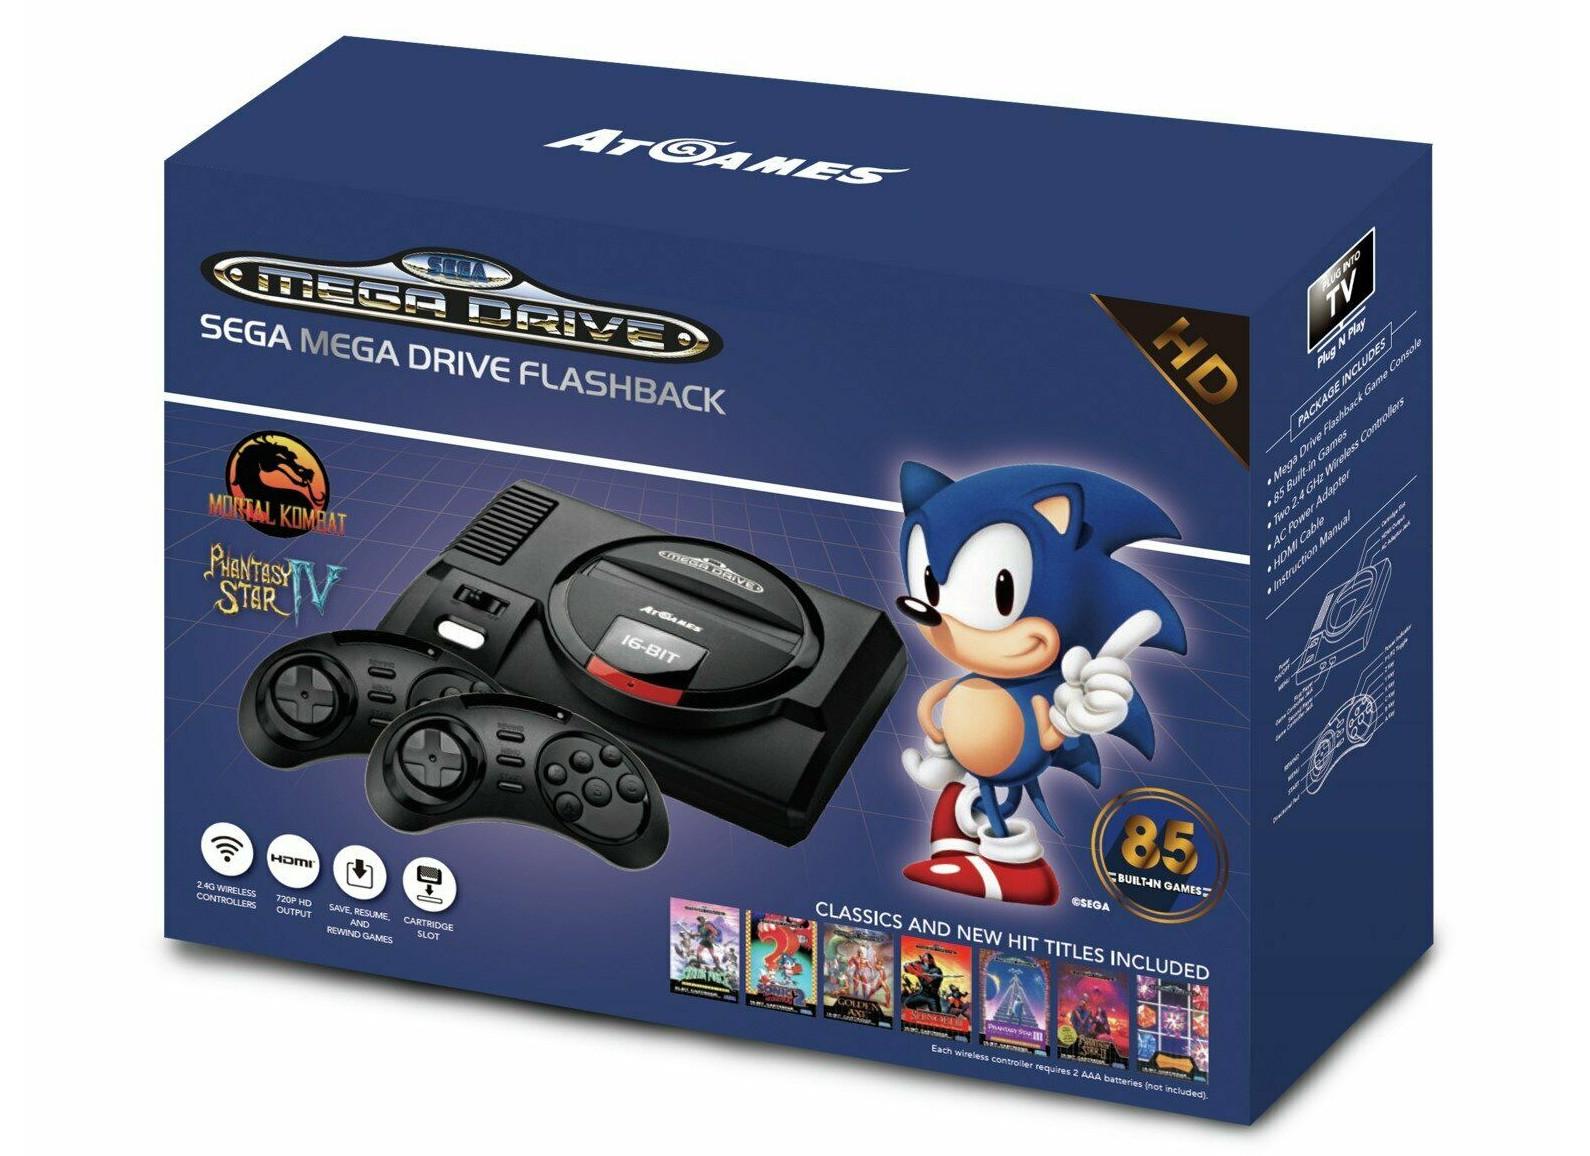 SEGA Mega Drive Flashback with 85 Games & 2 Wireless Controllers - £27.99 delivered @ Argos eBay